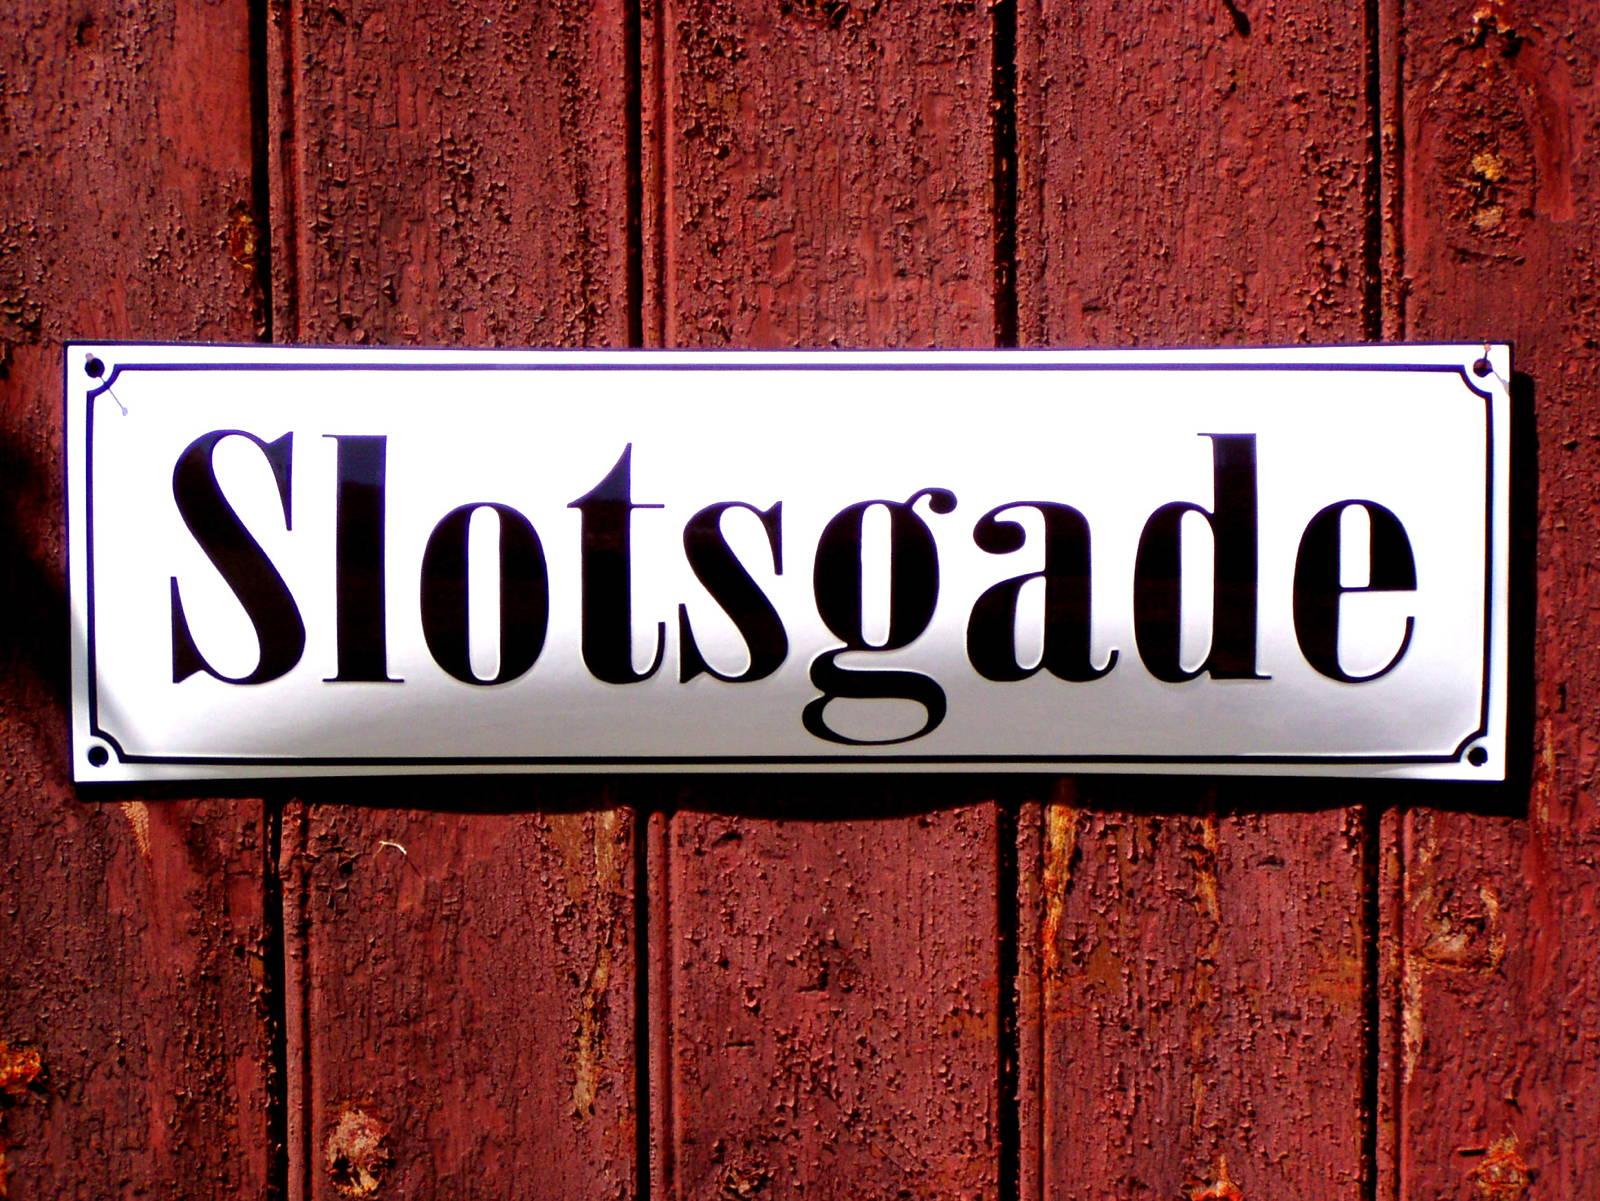 Slotsgade-P1010189-web1600